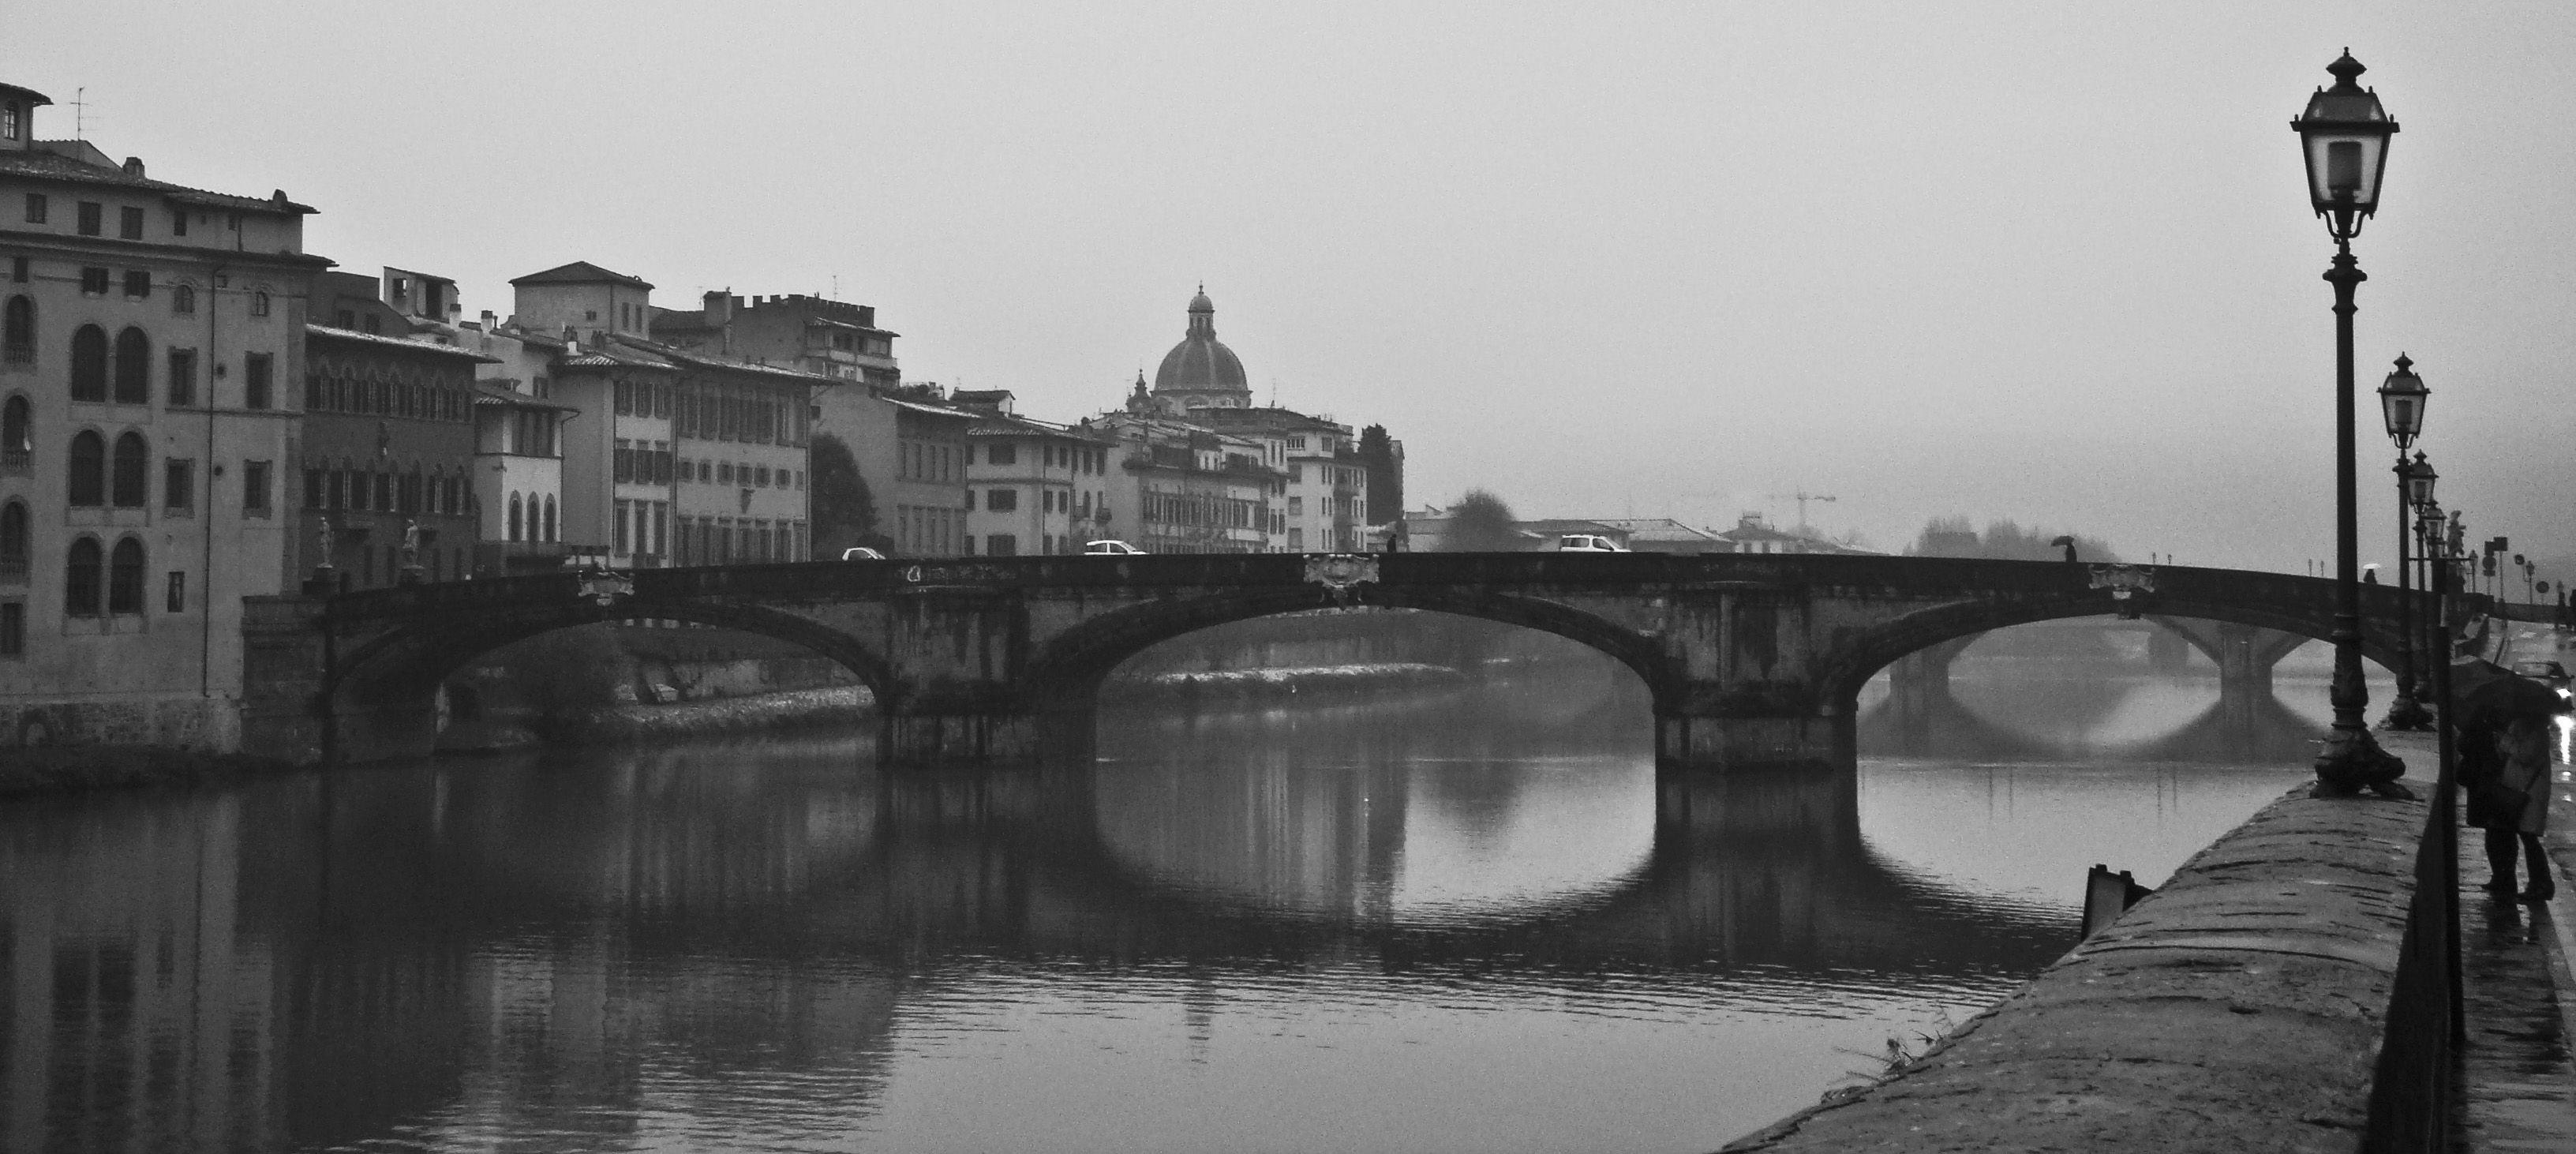 Photograph taken by Julie Howk of Julie Howk photography, in Florence, Italy.     http://juliehowkphotography.wordpress.com/#